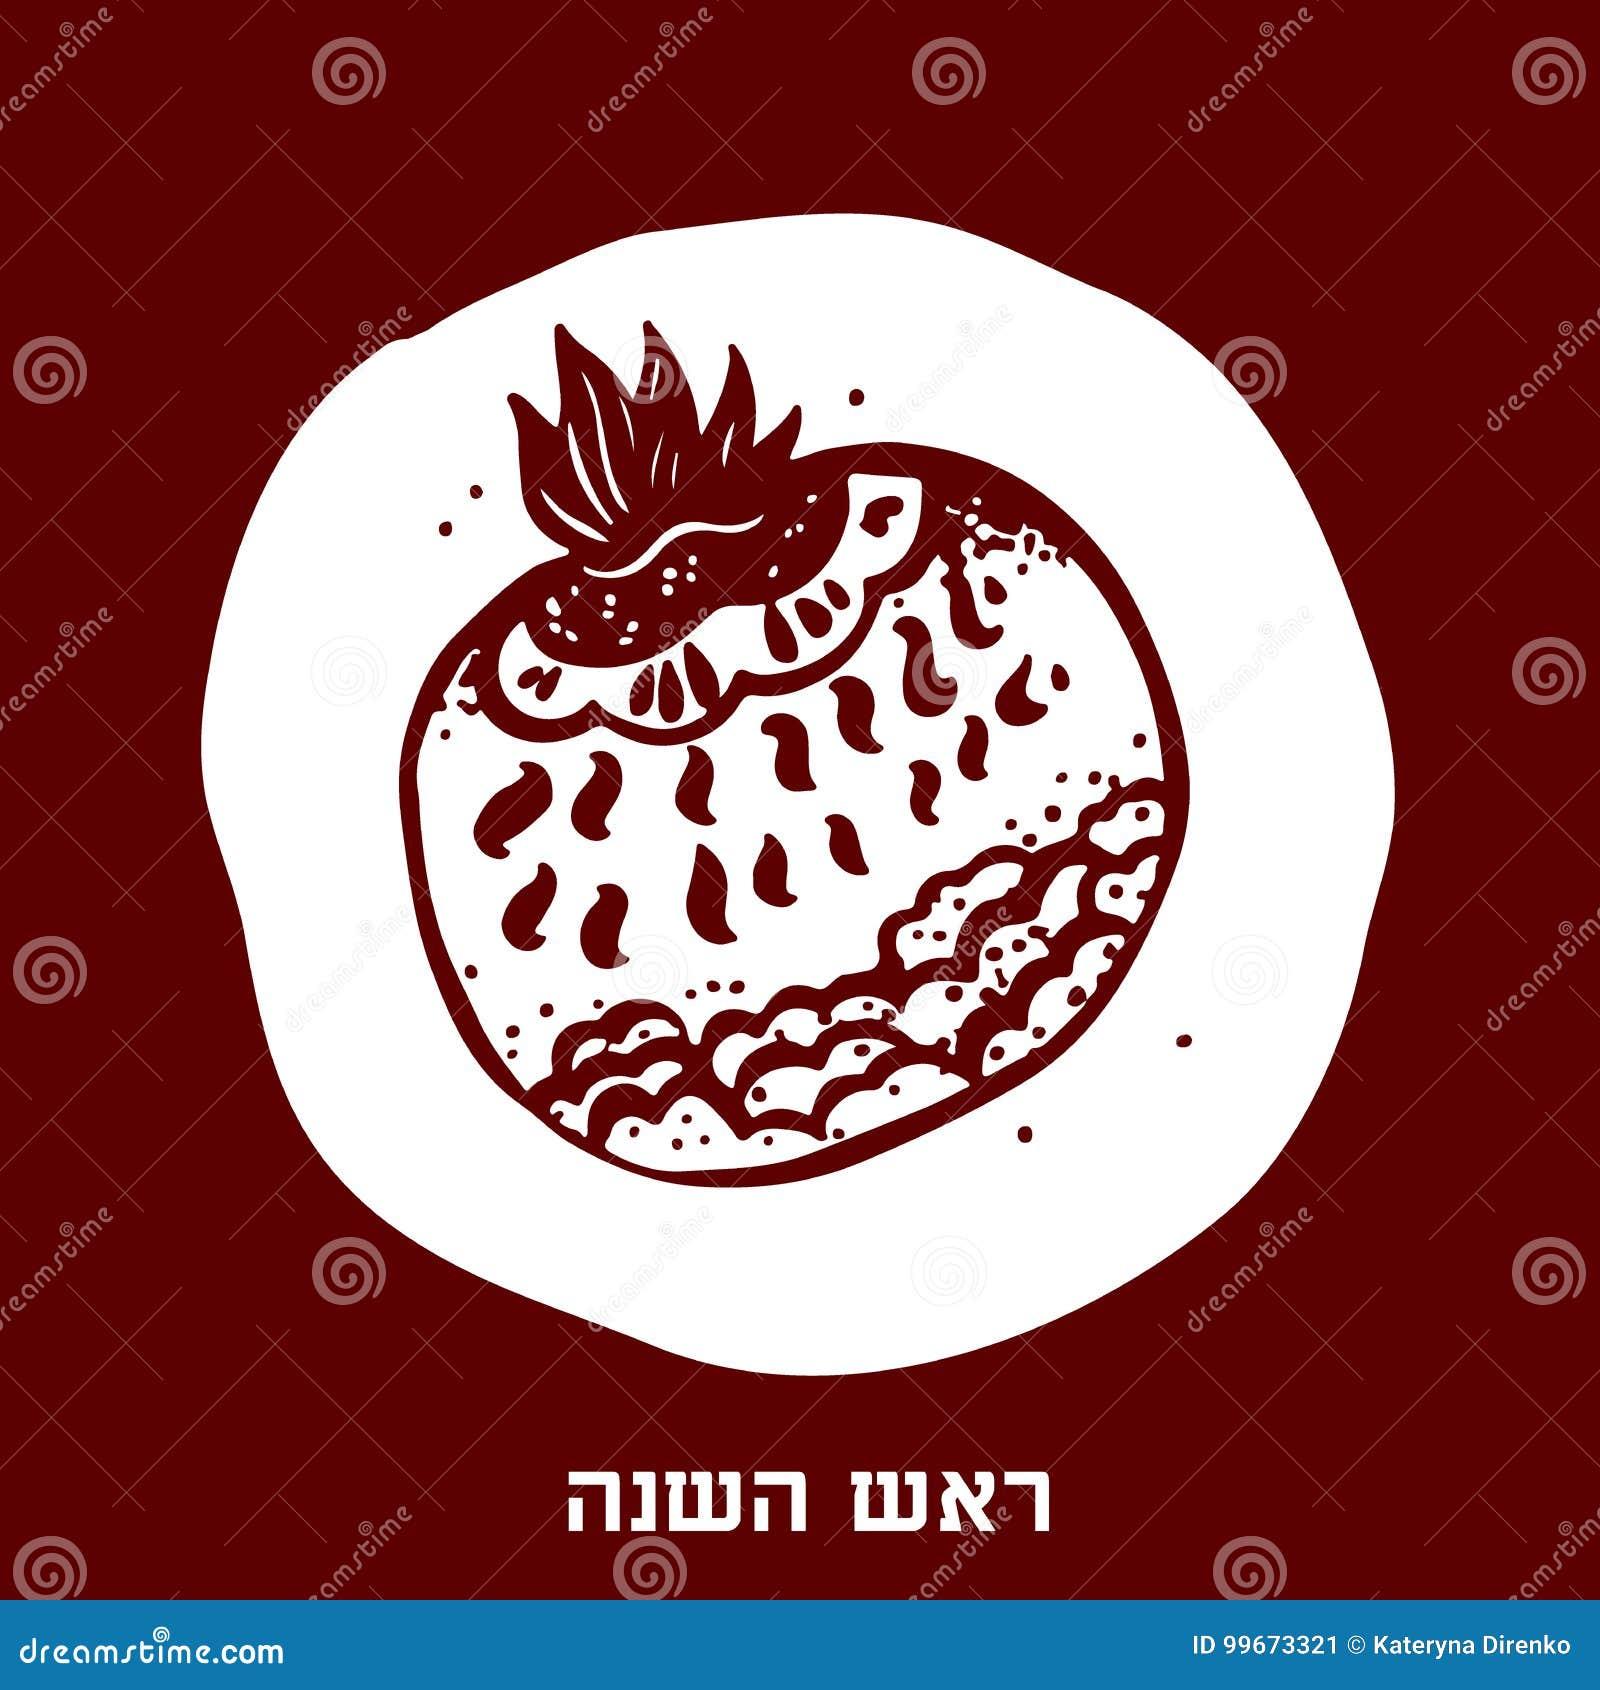 Rosh Hashana Jewish New Year Greeting Card With Abstract